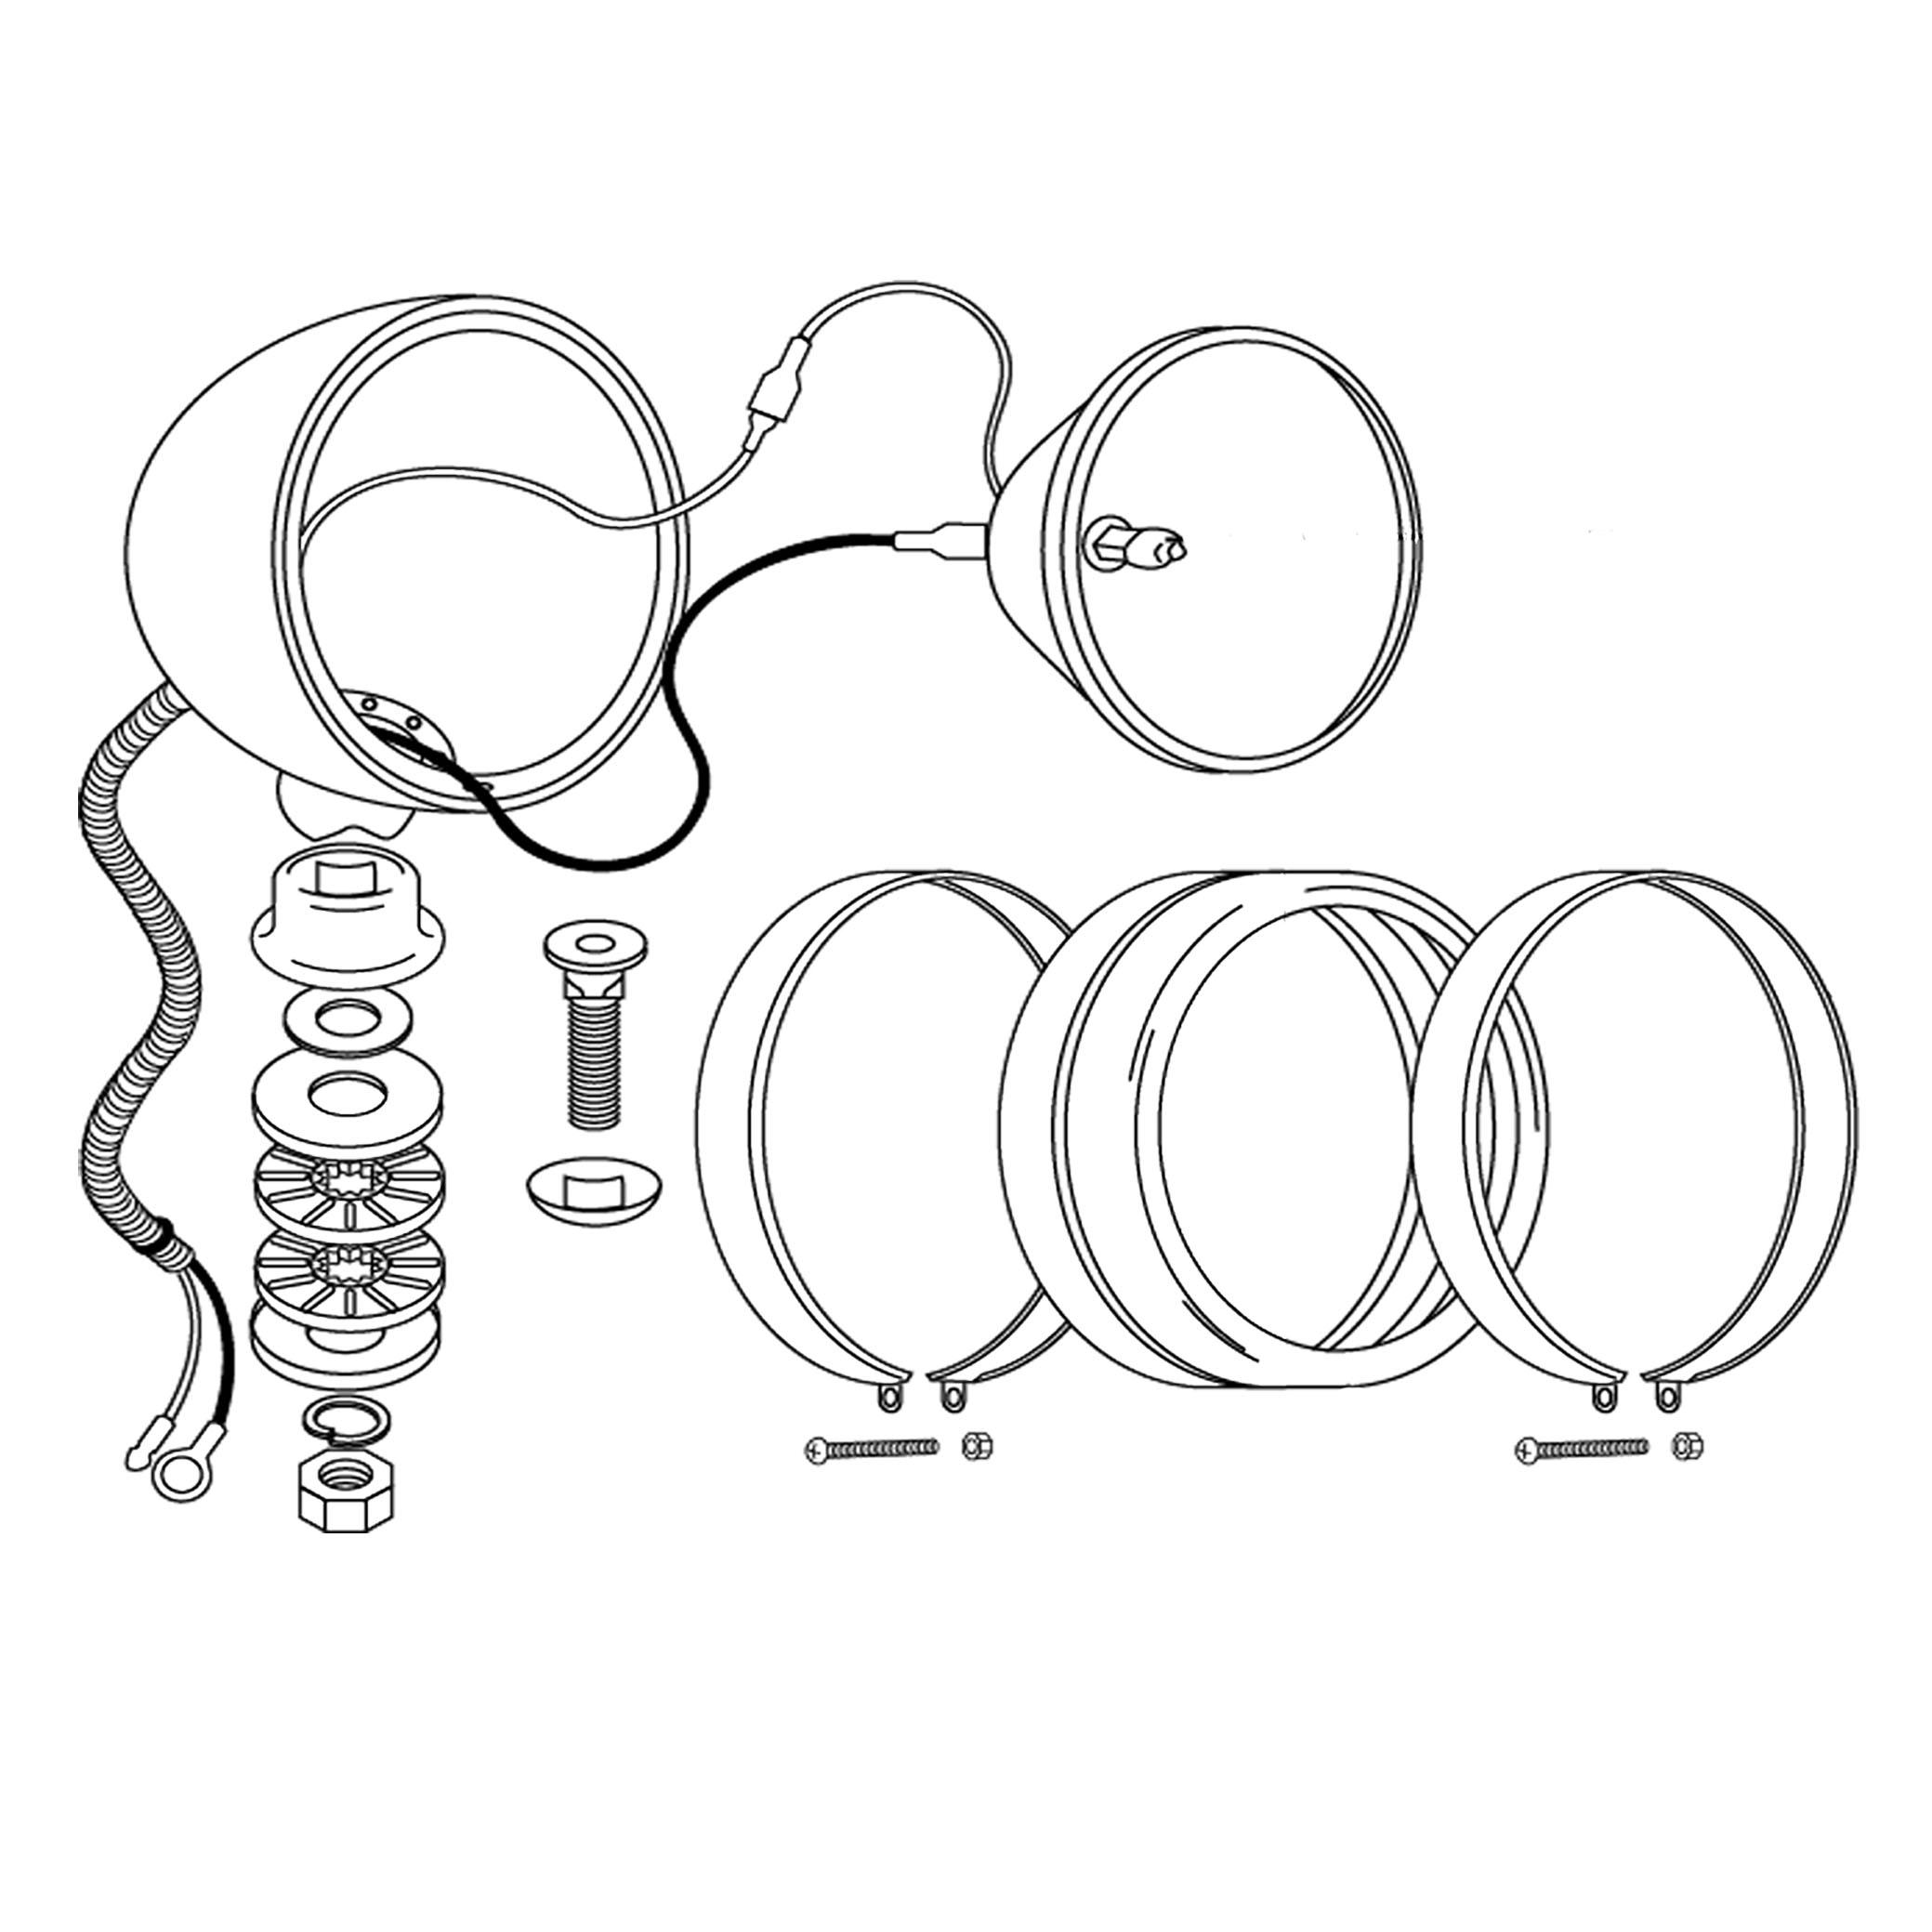 kc light wiring harness diagram s30 wiring